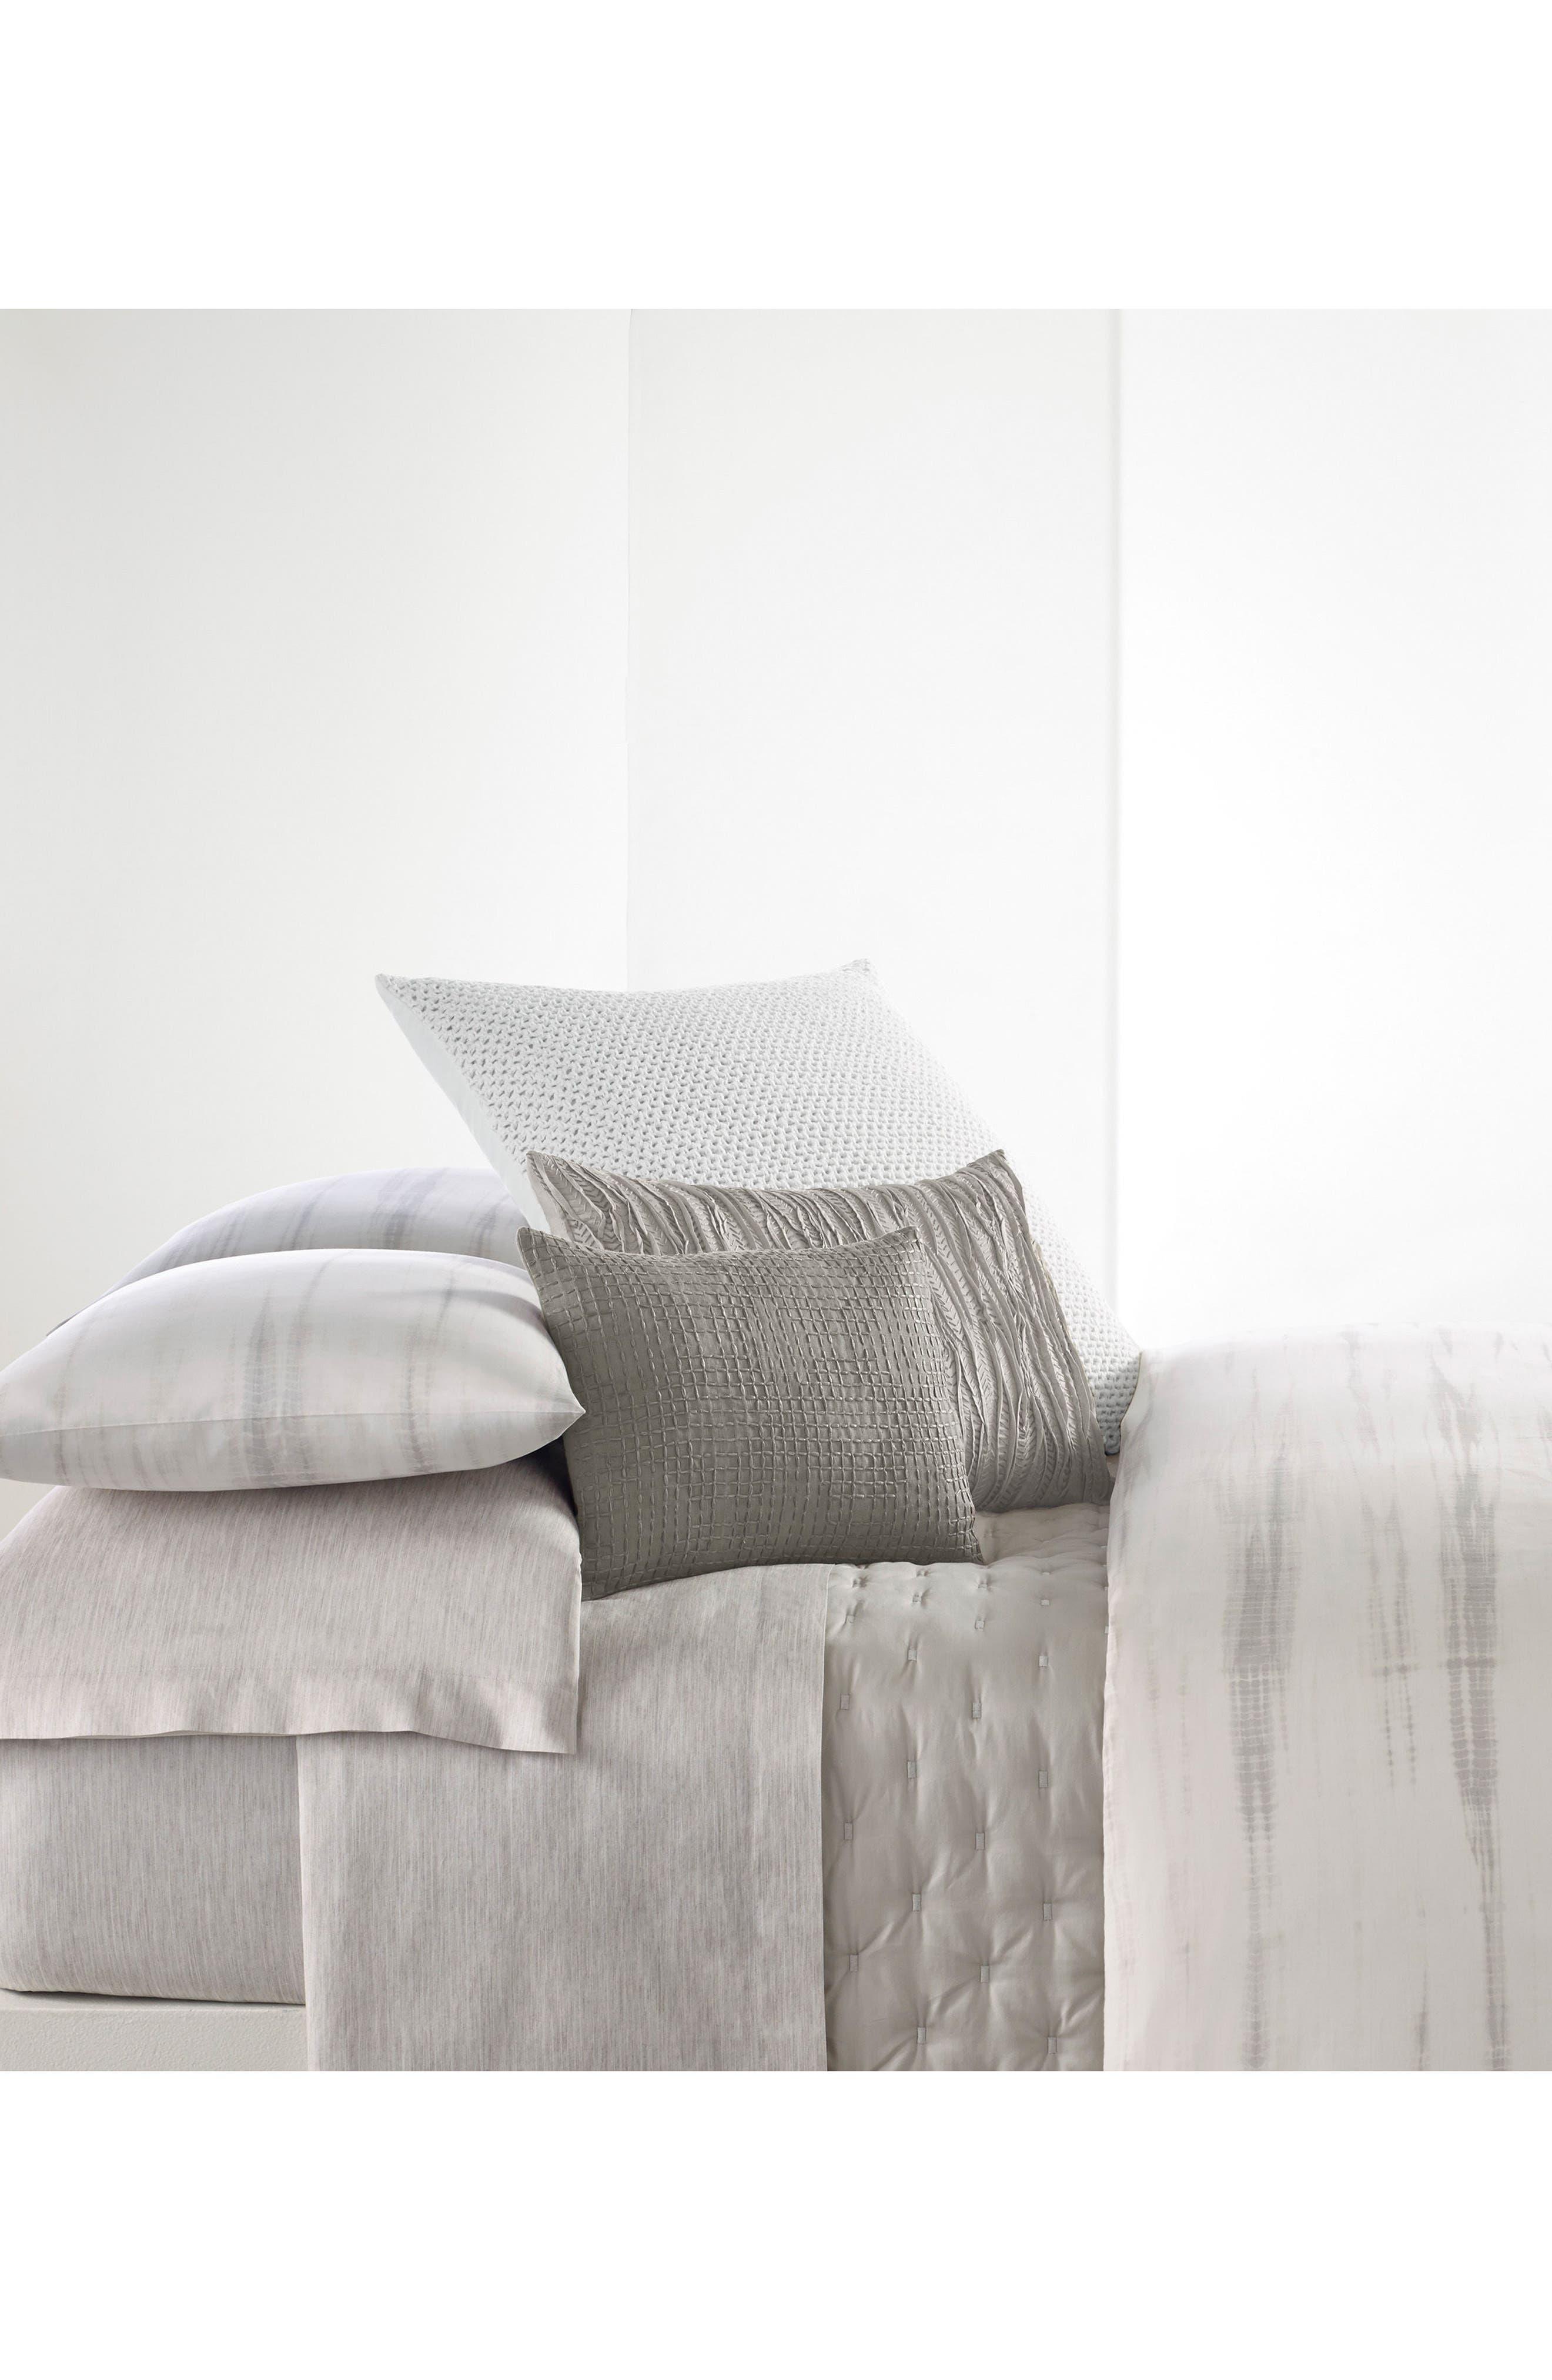 Marble Shibori 300 Thread Count Pillowcases,                             Alternate thumbnail 2, color,                             Lt/ Gray